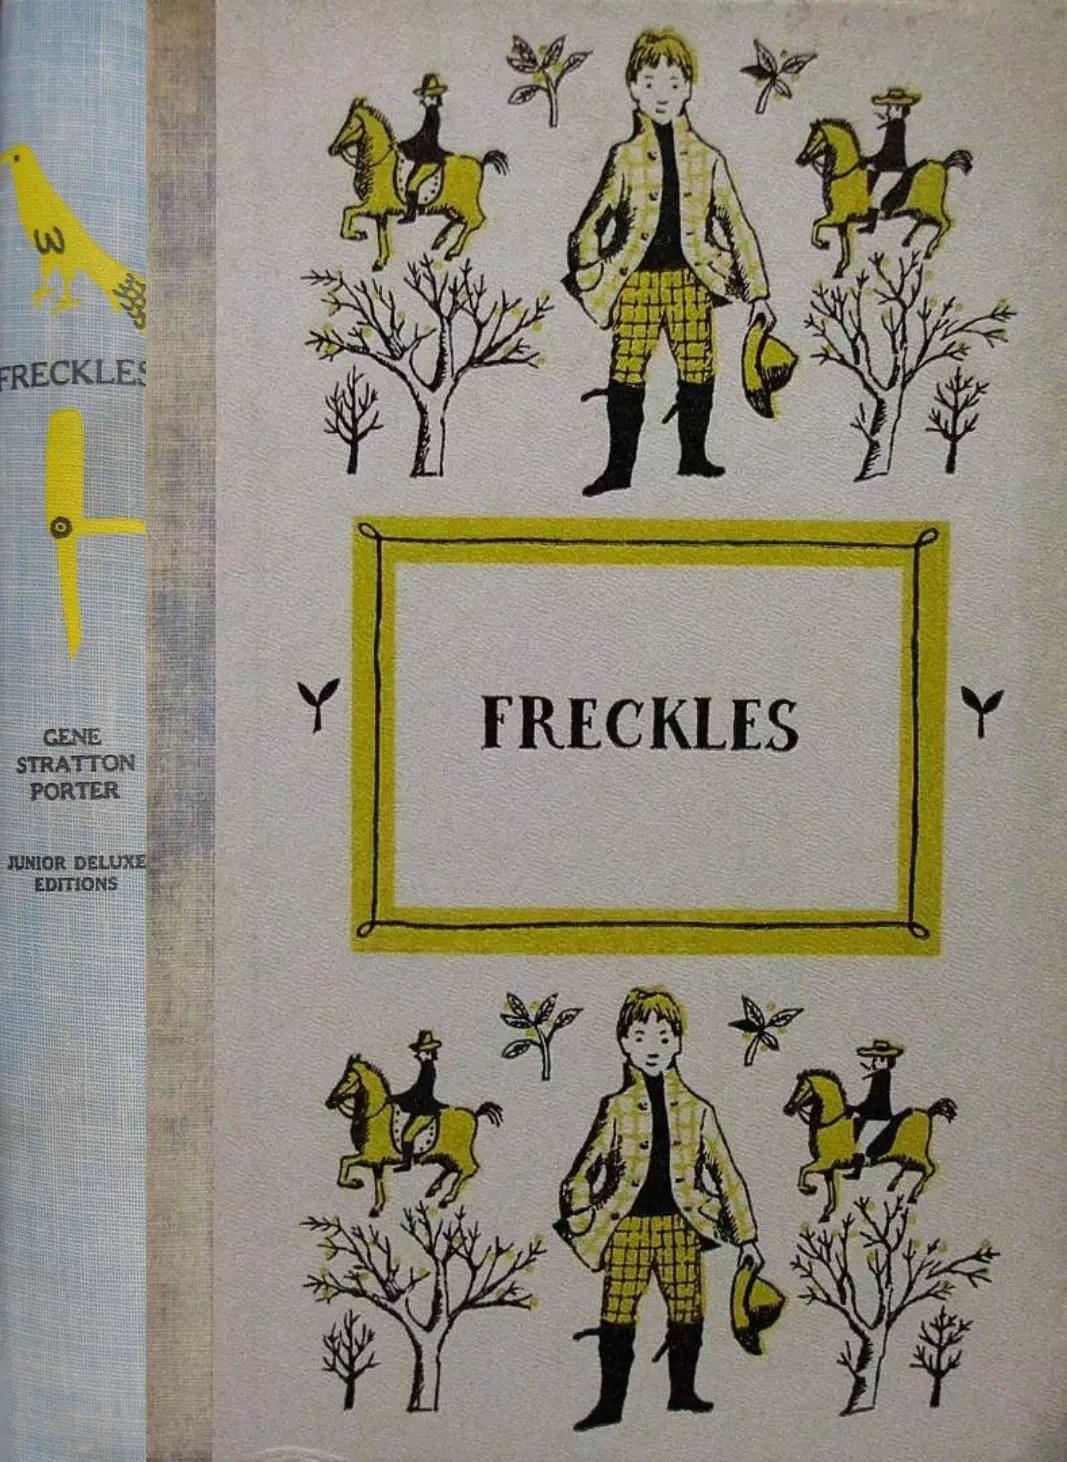 JDE Freckles blue spine FULL cover